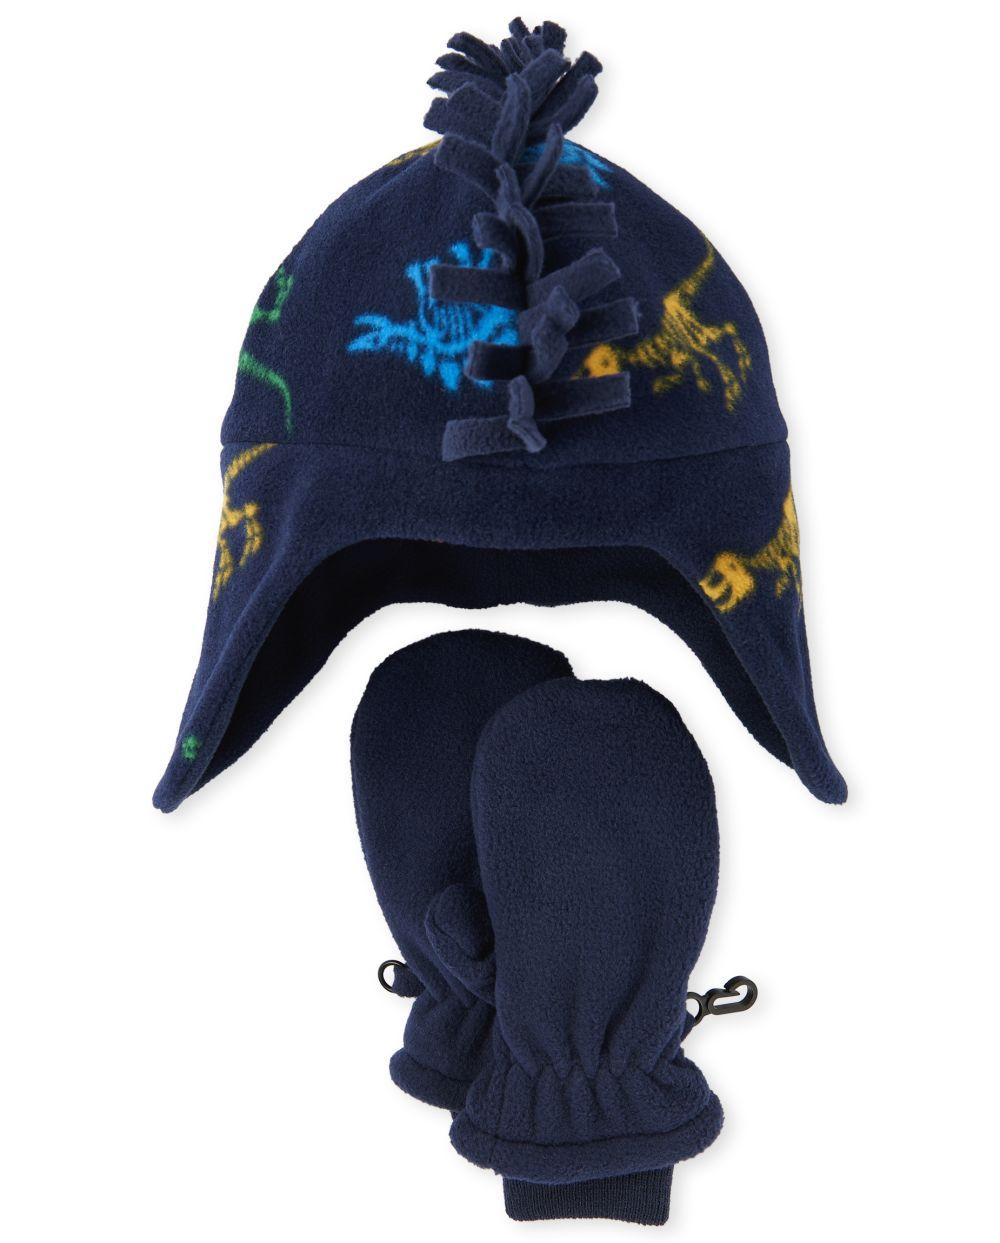 Toddler Boys Dino Glacier Fleece Hat And Mittens Set